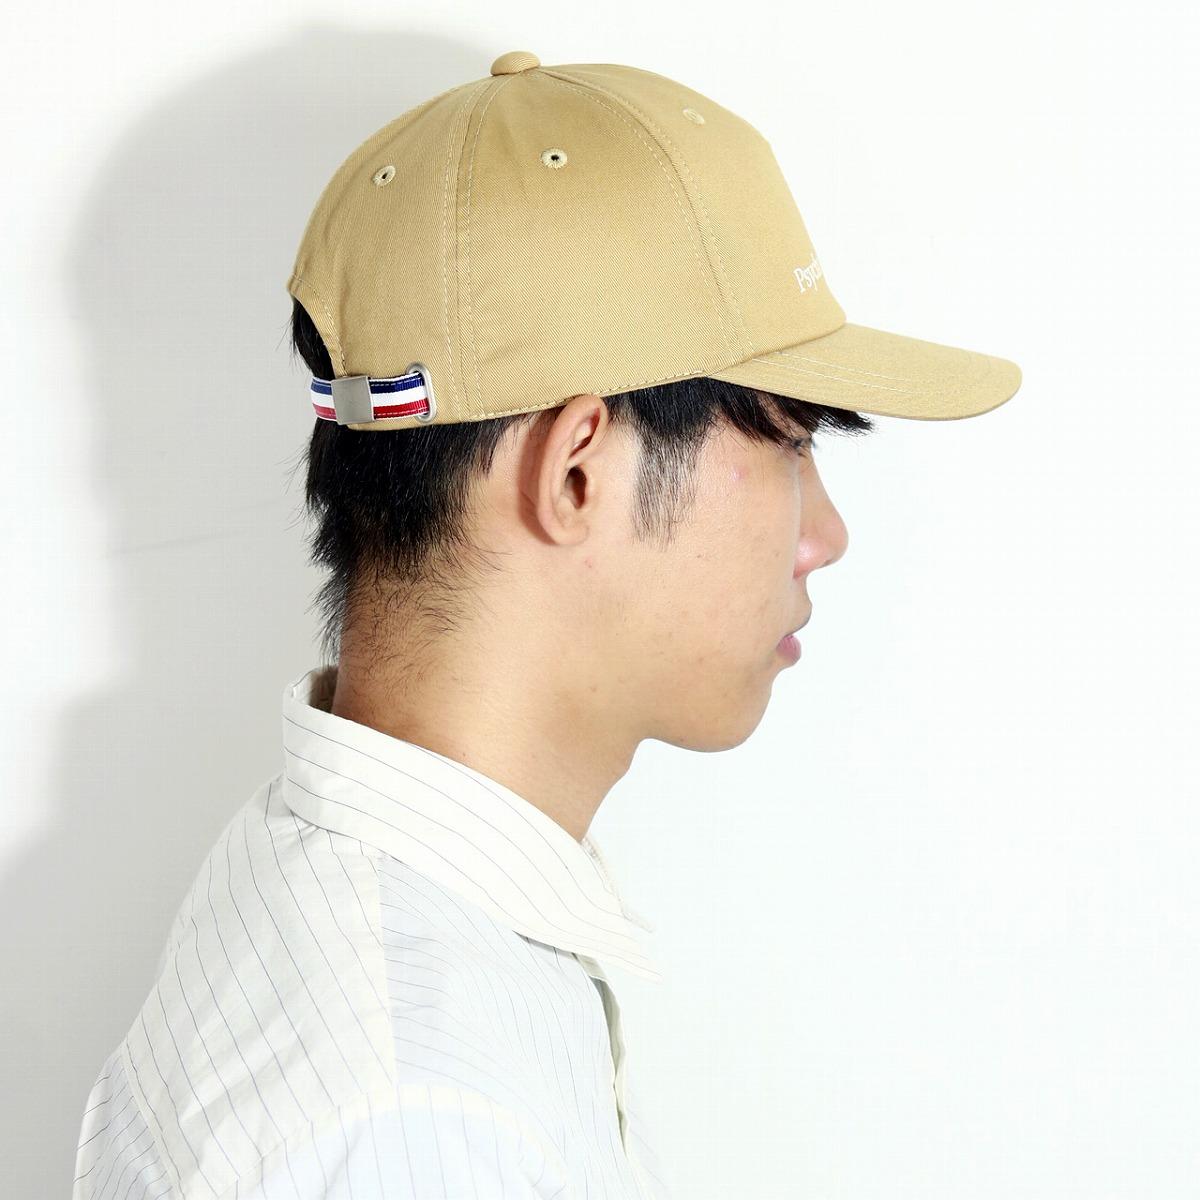 ea6471ccf50ef ELEHELM HAT STORE  Mark brand Bupleurum Root bunny cap men cotton ...